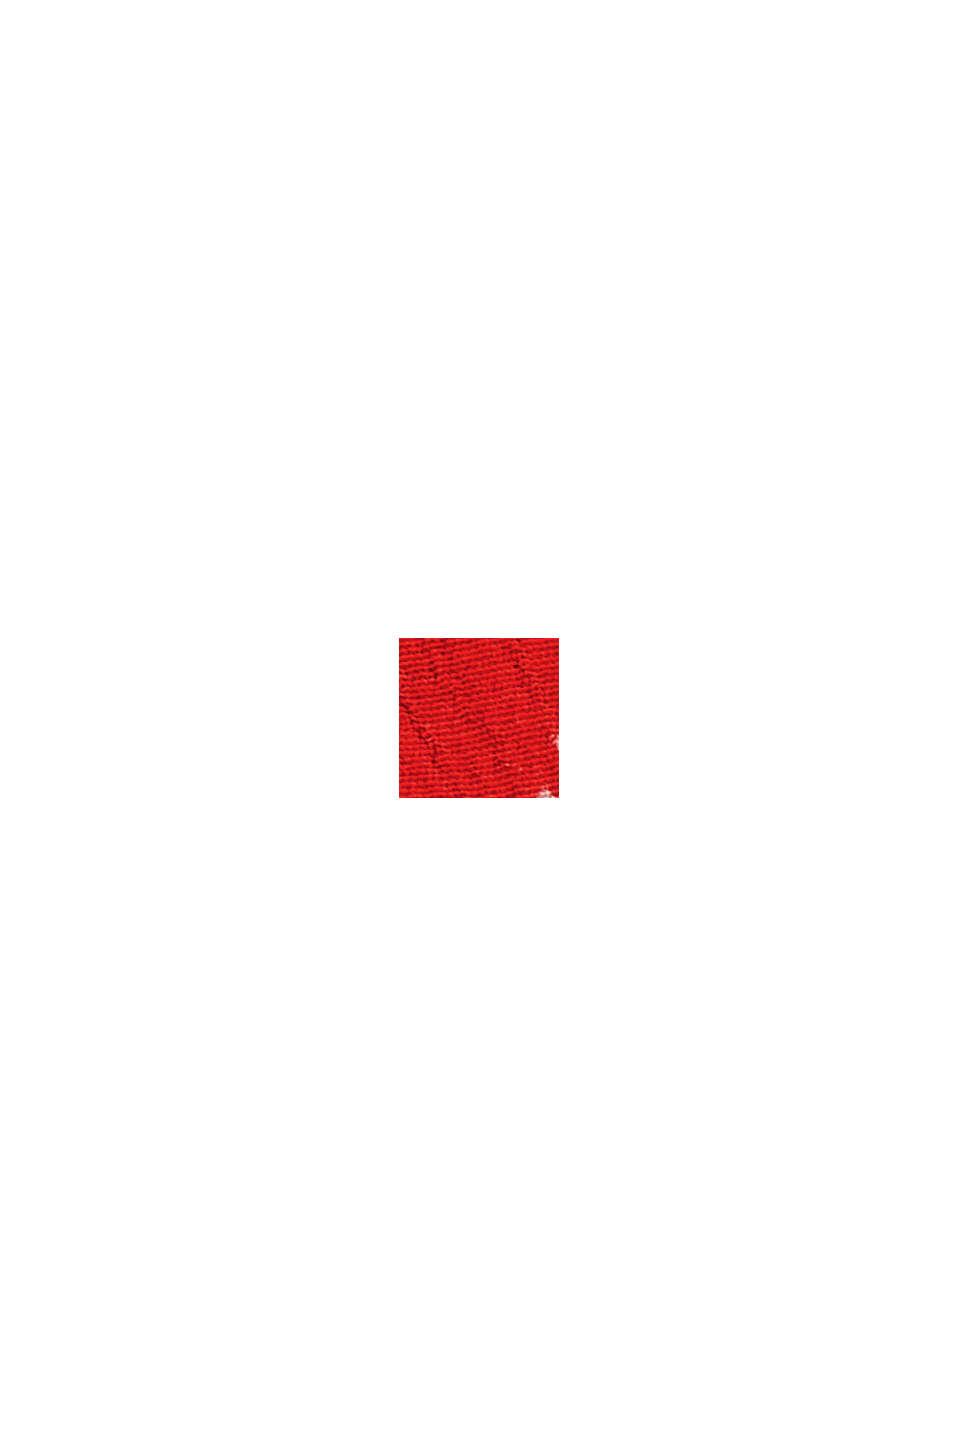 Blusa estampada con volante, LENZING™ ECOVERO™, RED, swatch